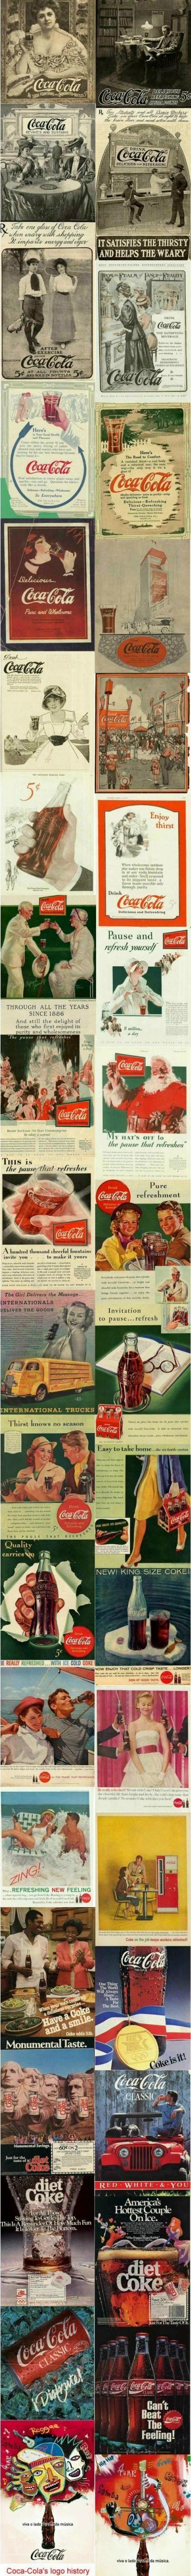 Coca Cola Old Ads